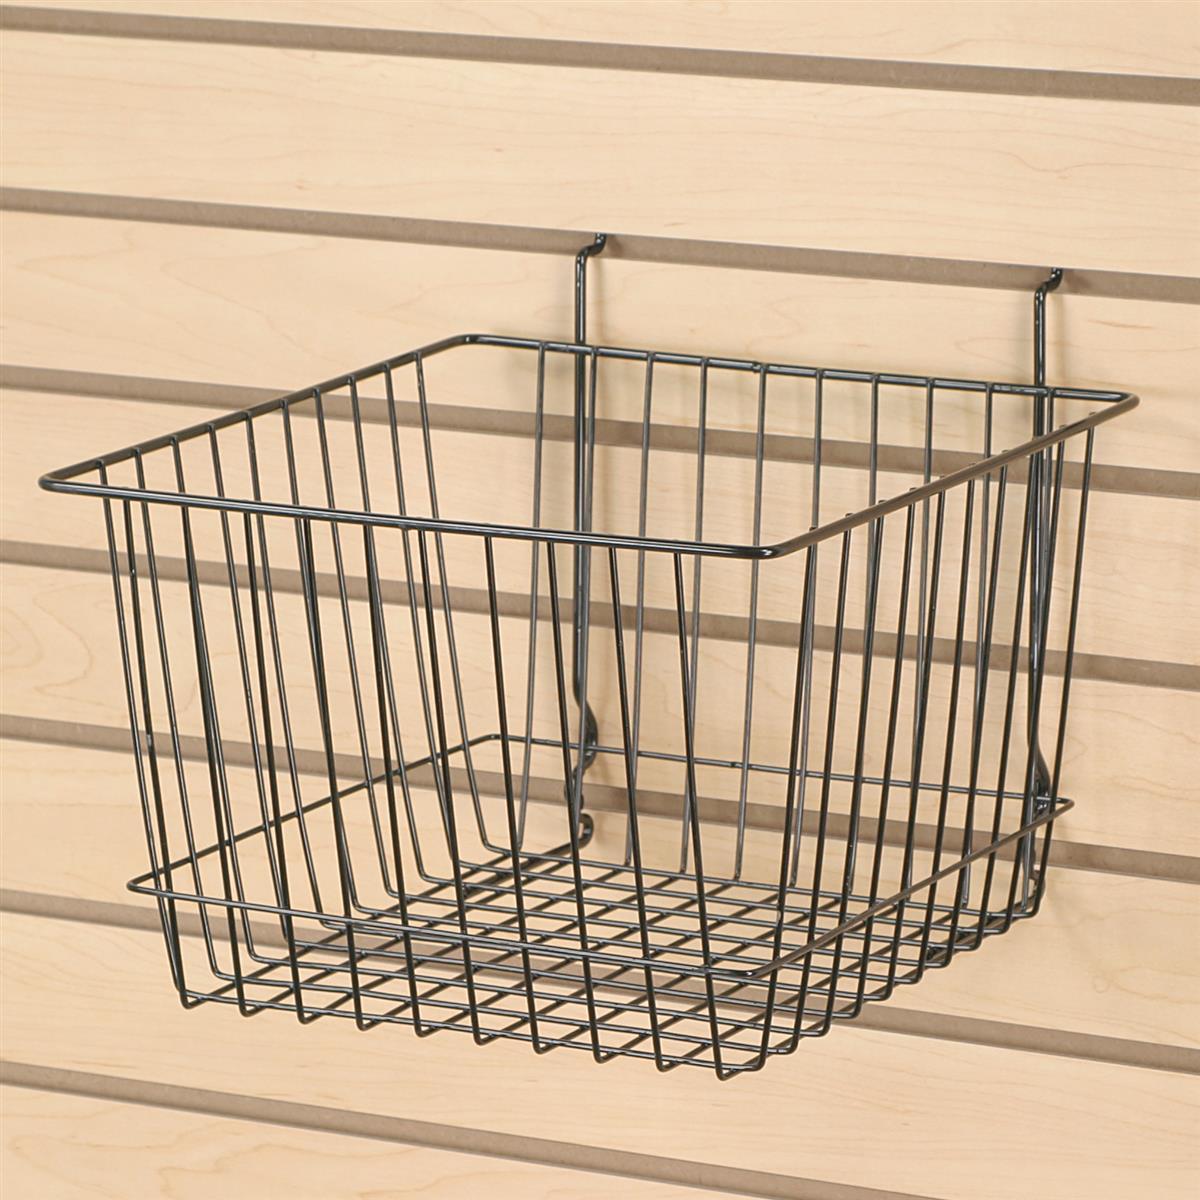 Slatwall Amp Gridwall Wire Basket Hanging Merchandising Bin